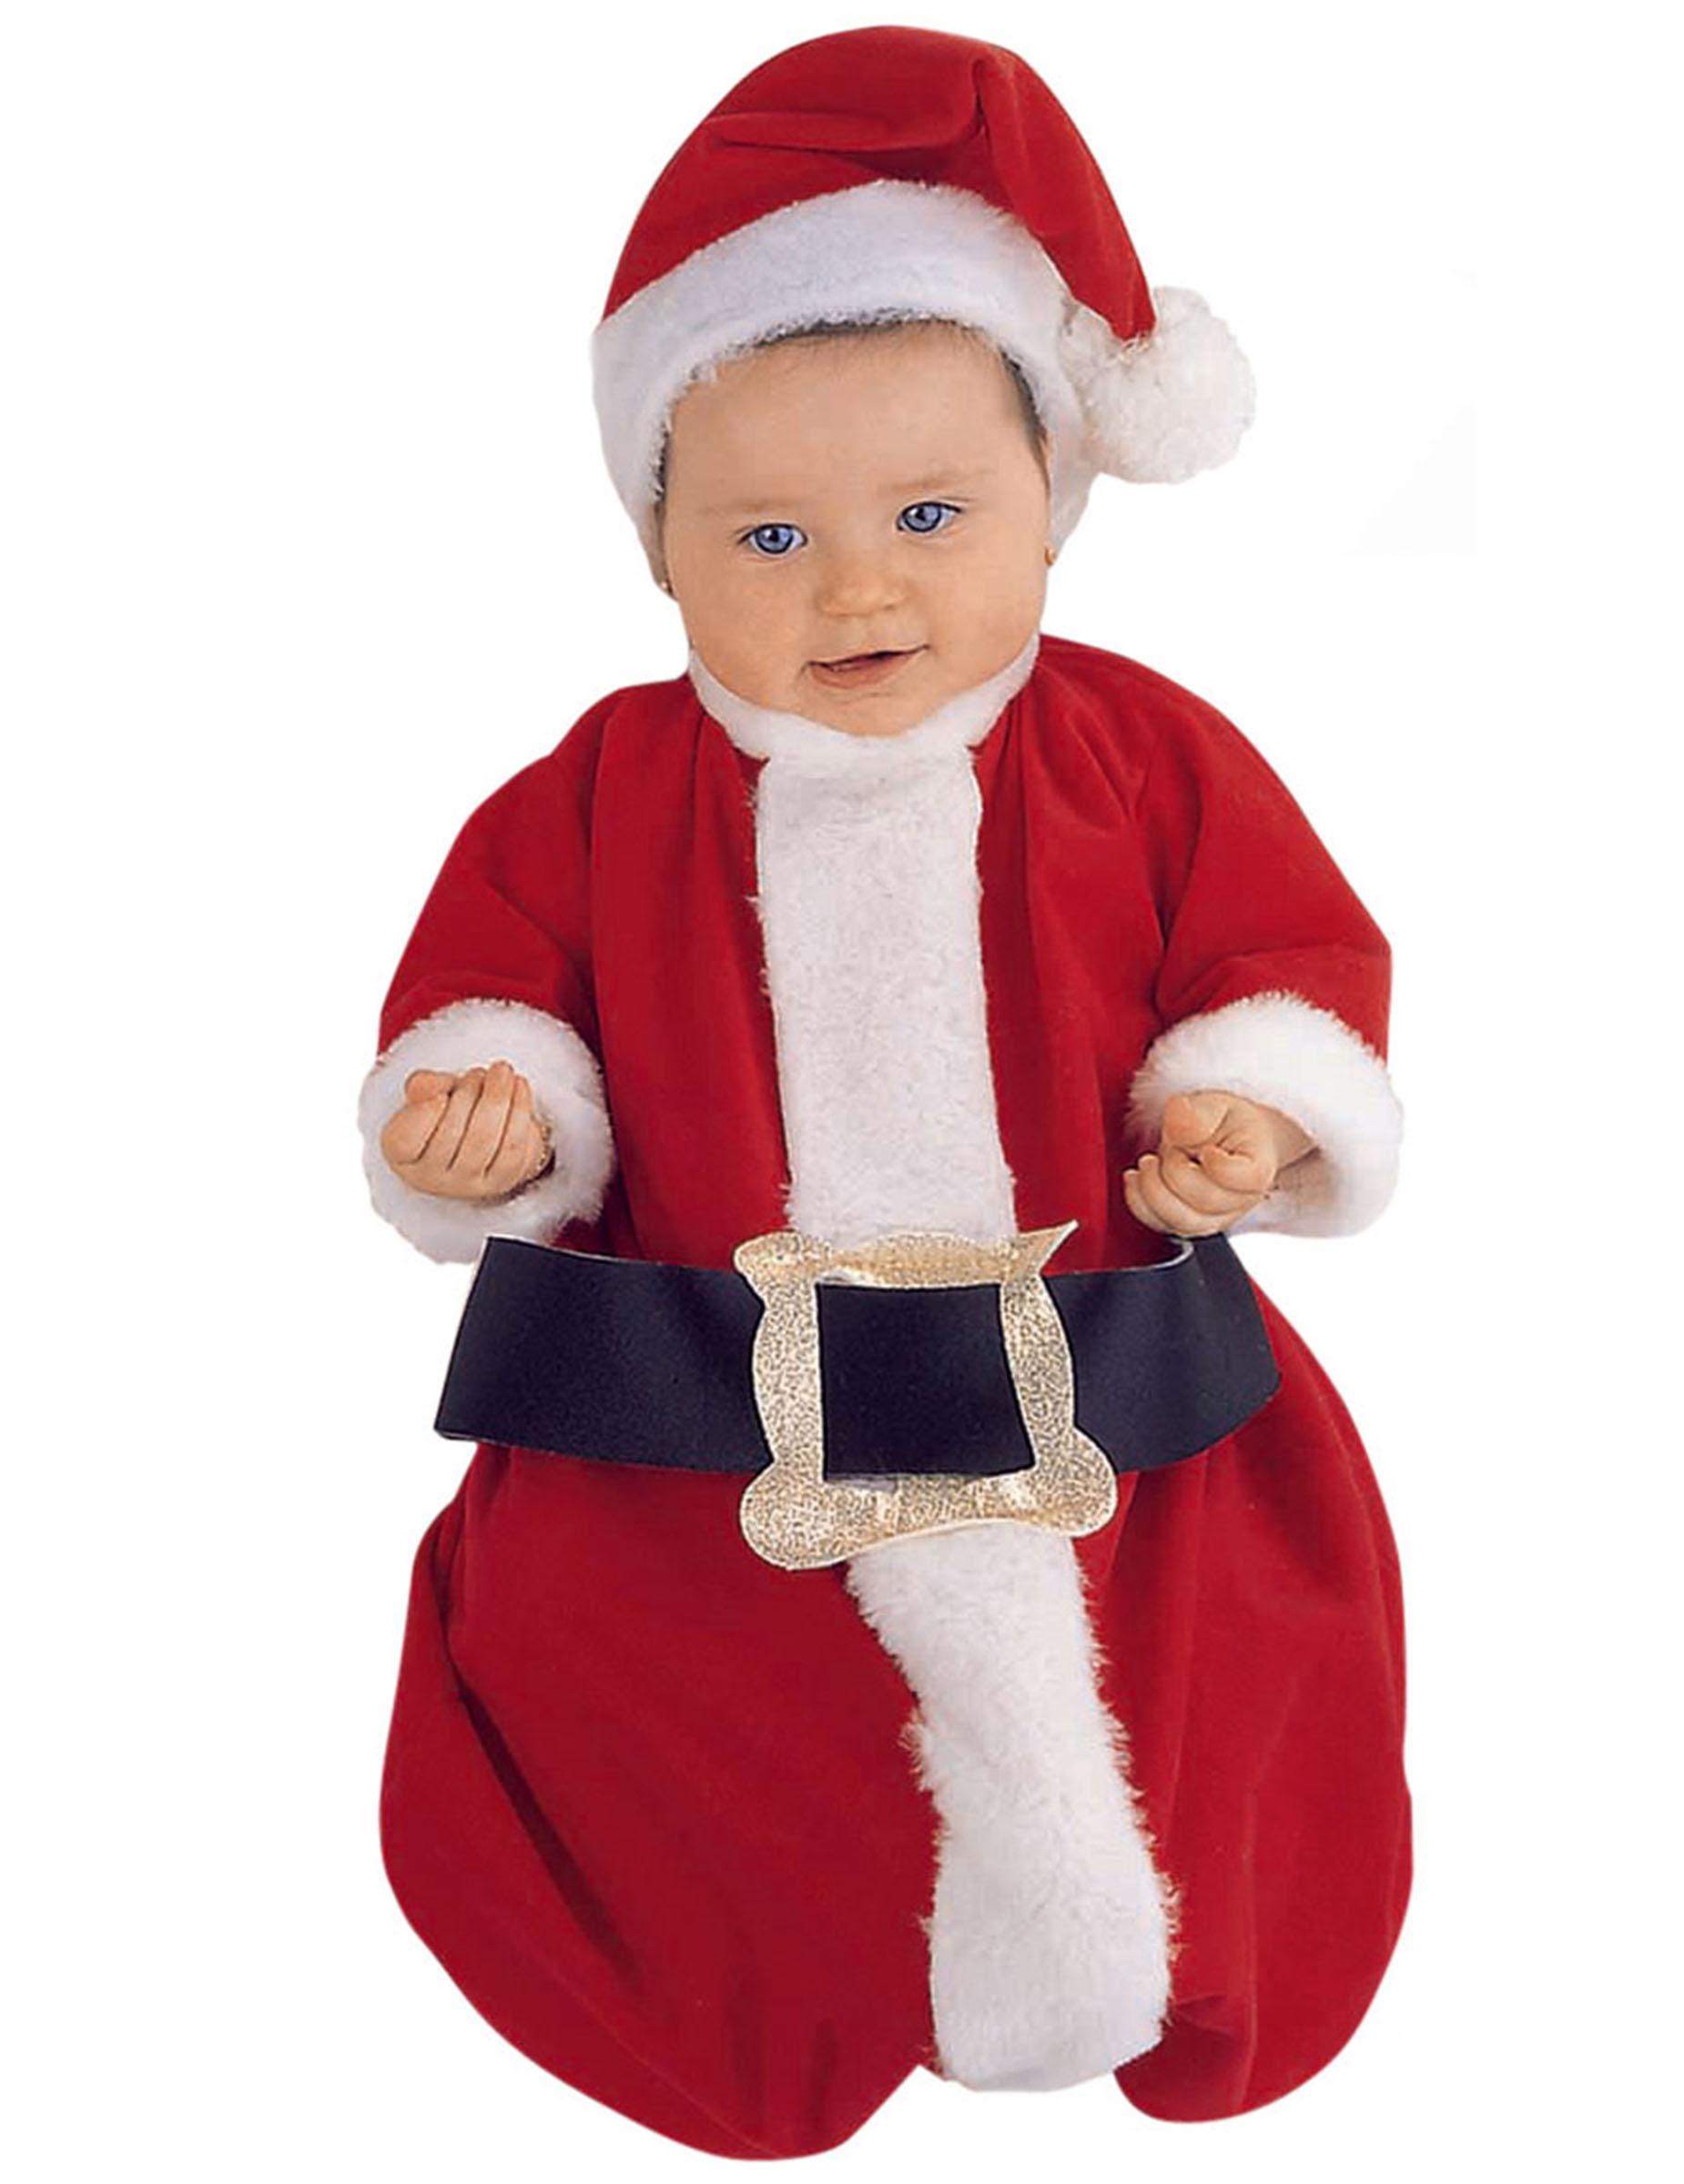 49a44d508d1c Disfarce pai natal luxo bebé: Disfarces Crianças,mascarilhas e fatos ...